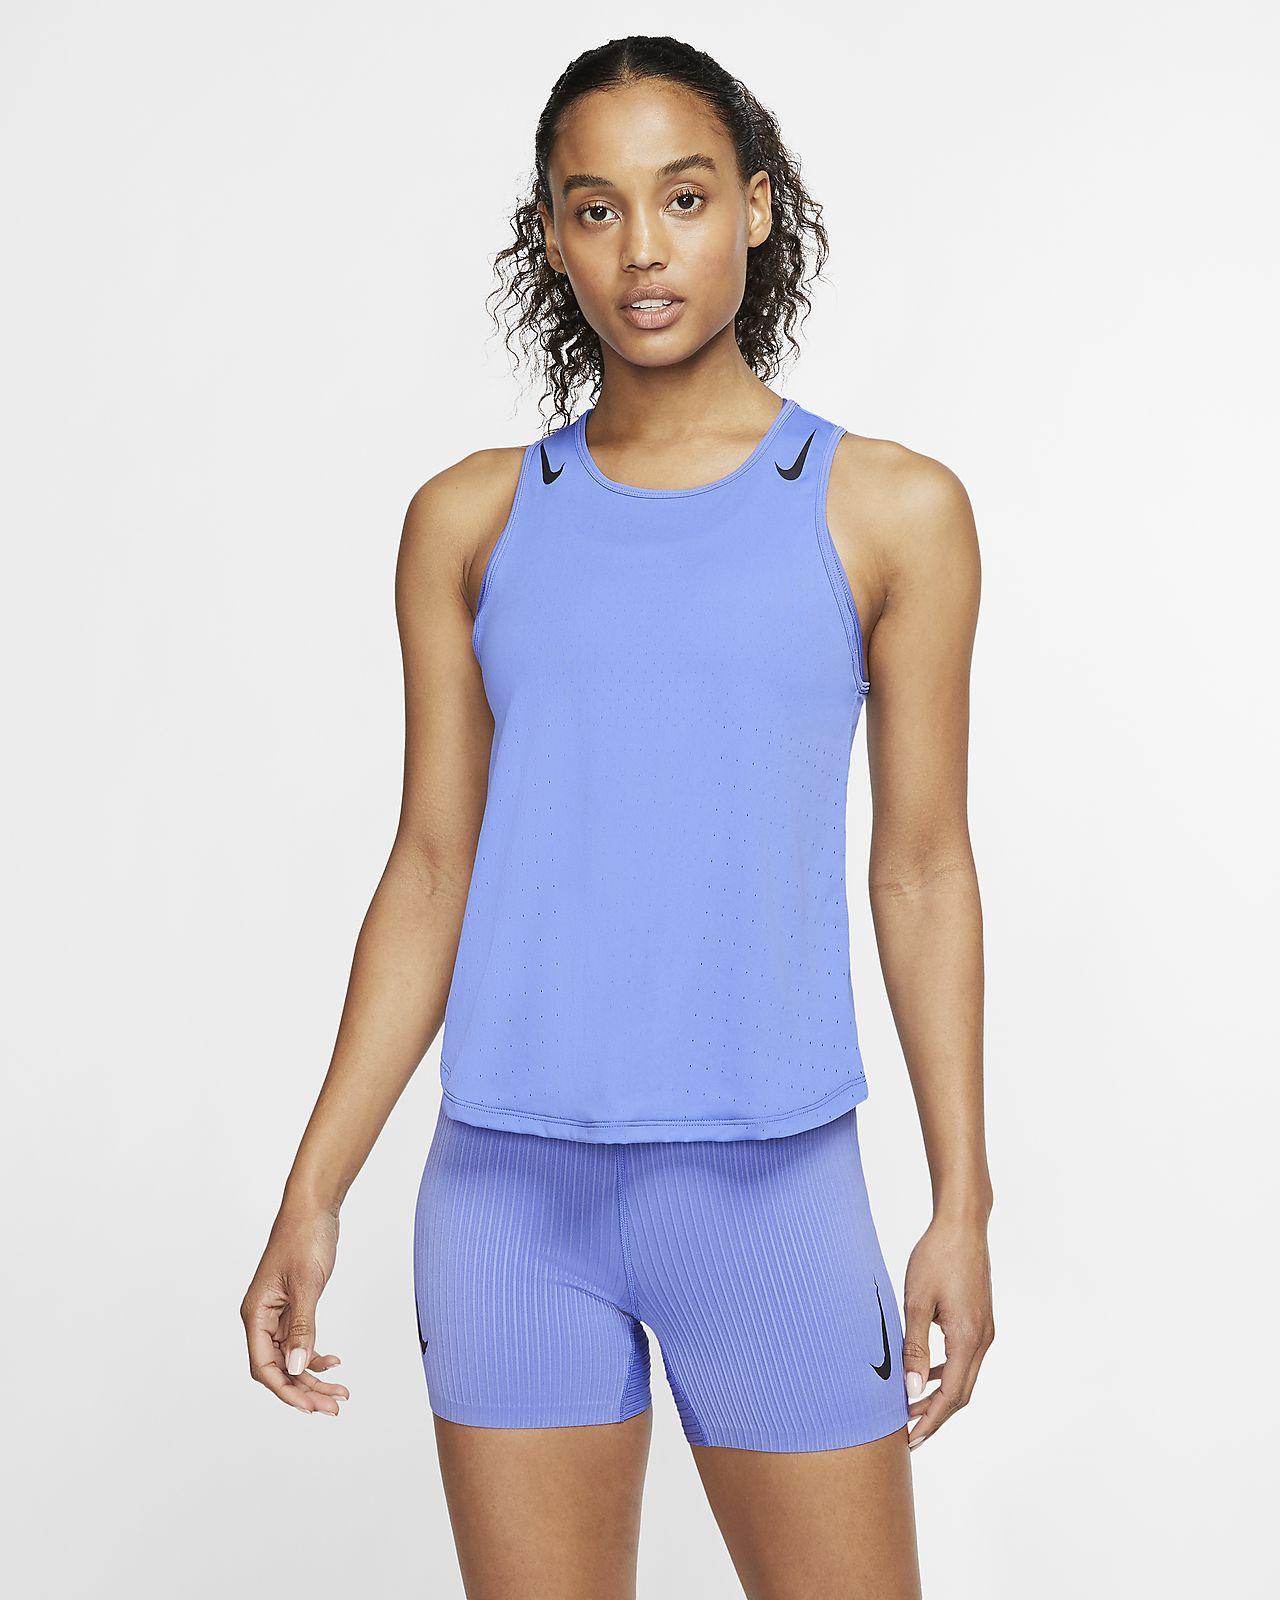 Nike AeroSwift Women's Running Gilet